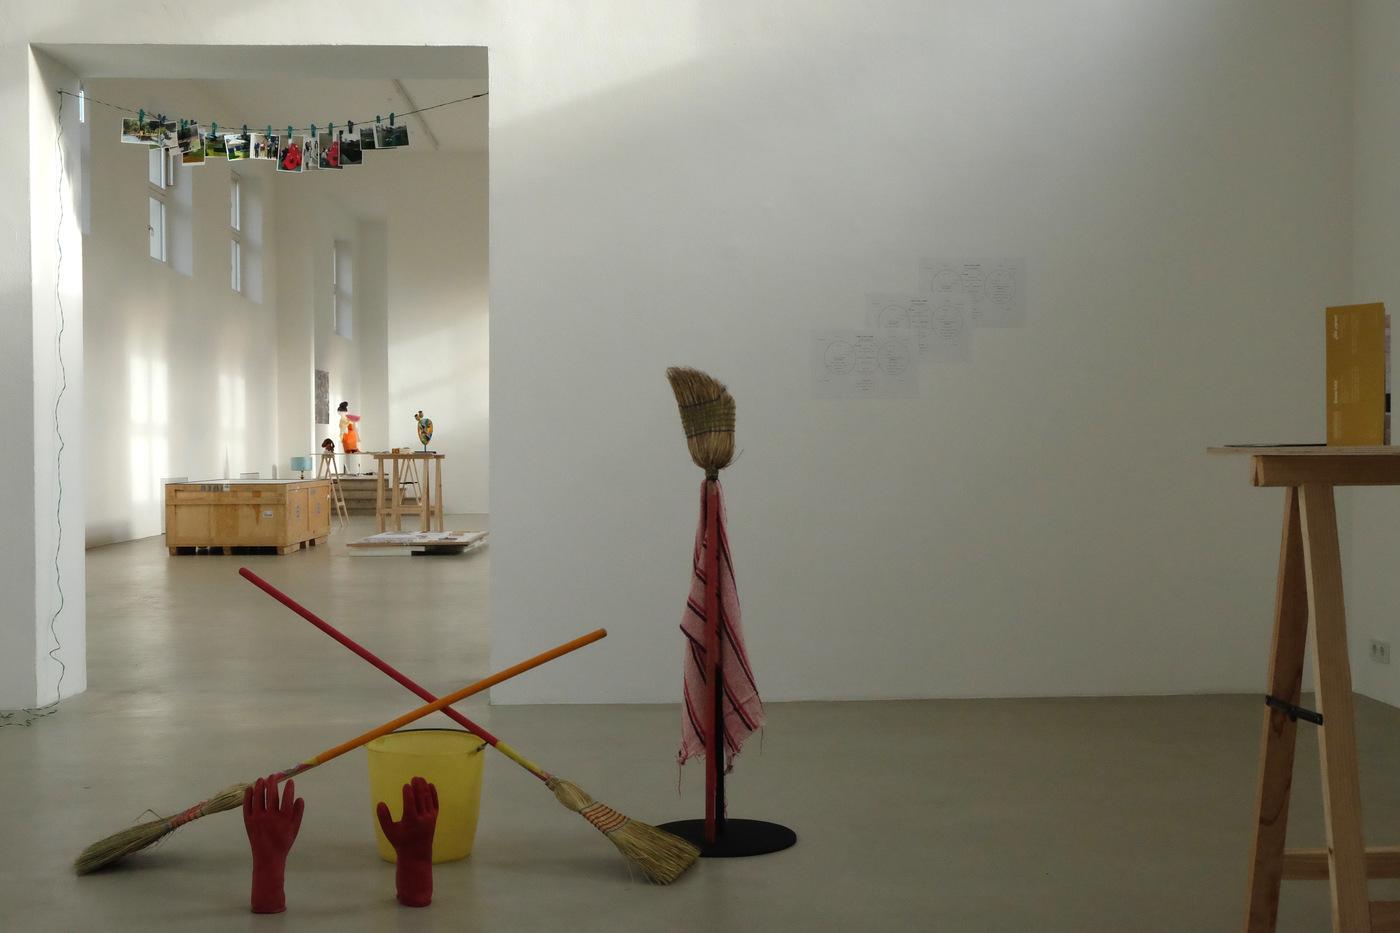 Darius Mikšys, Hayward & Tamayo, Exhibition View in Kunstverein München 2016 © Kunstverein München e.V._44